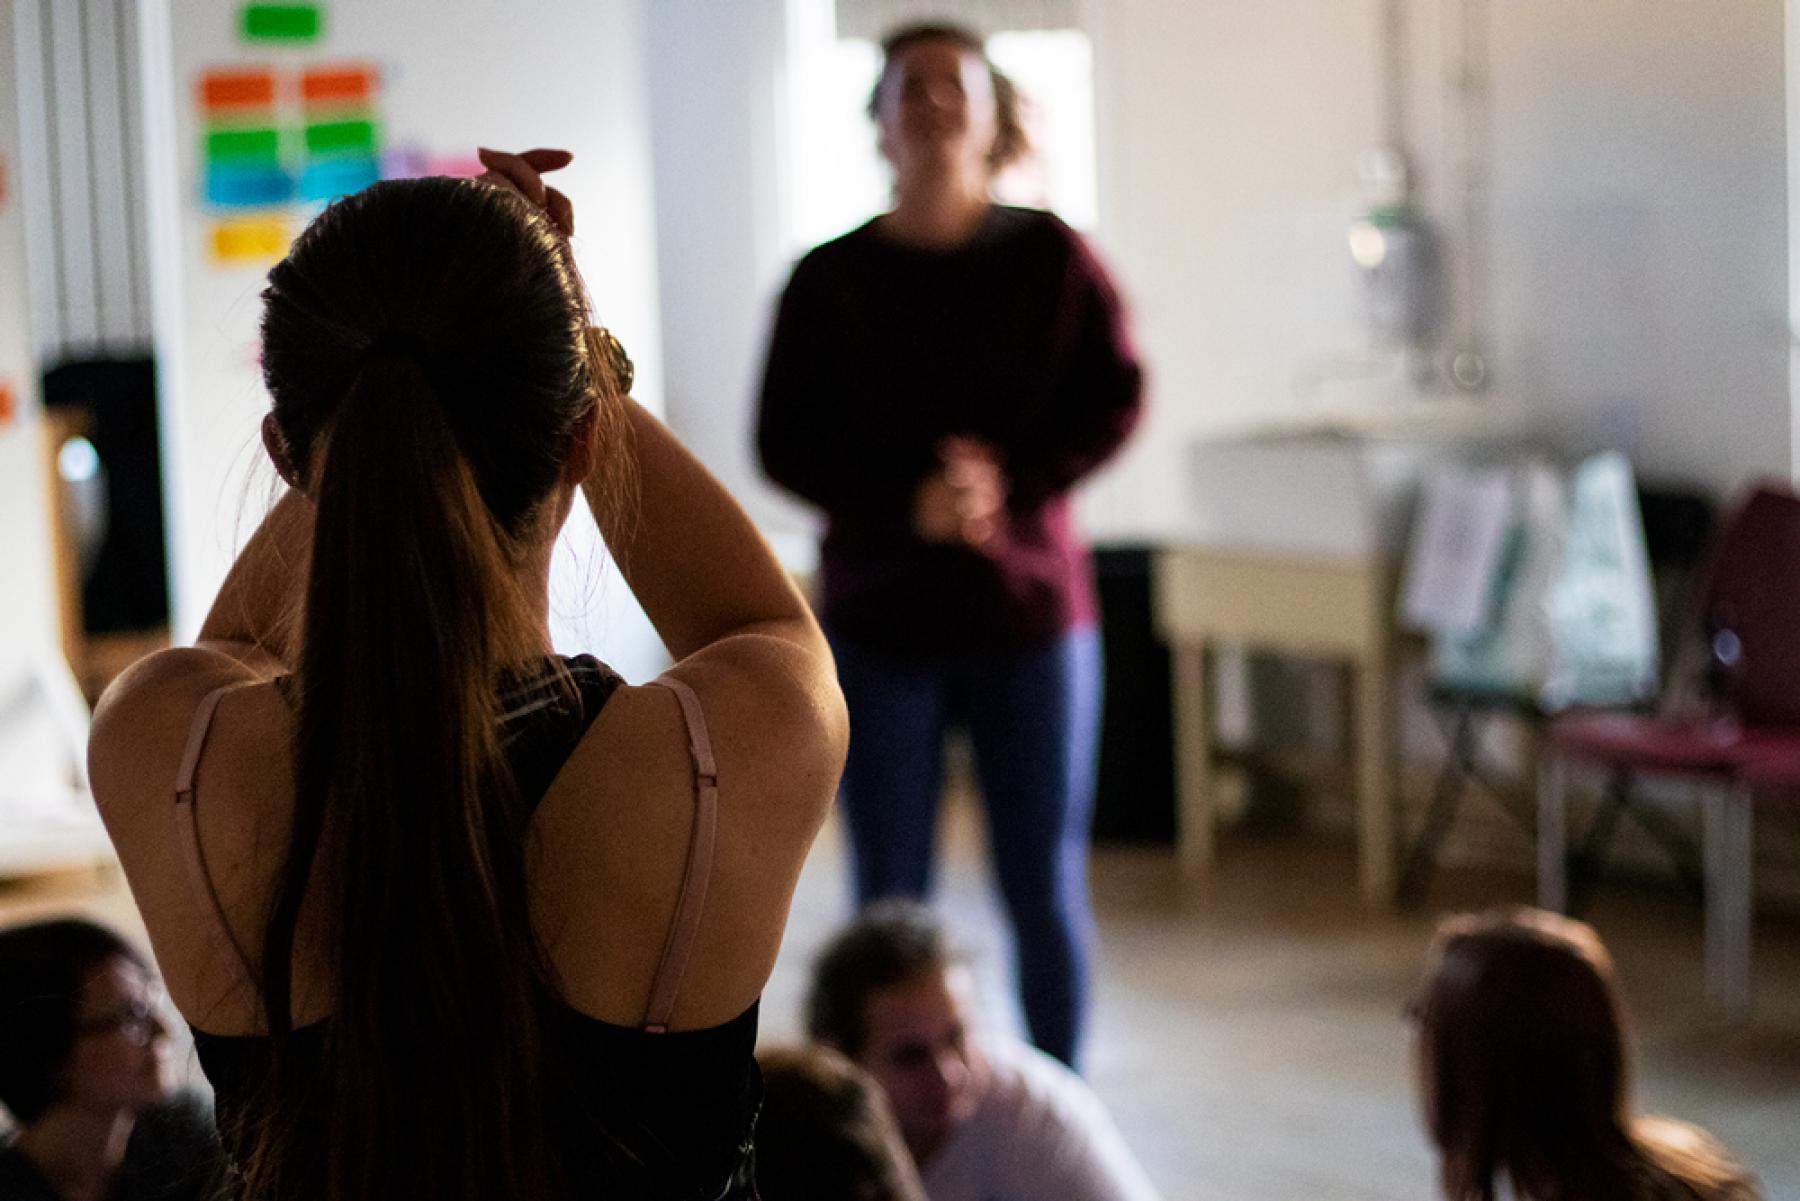 PONToon Dance and Coding Workshop - Interactive digital performance